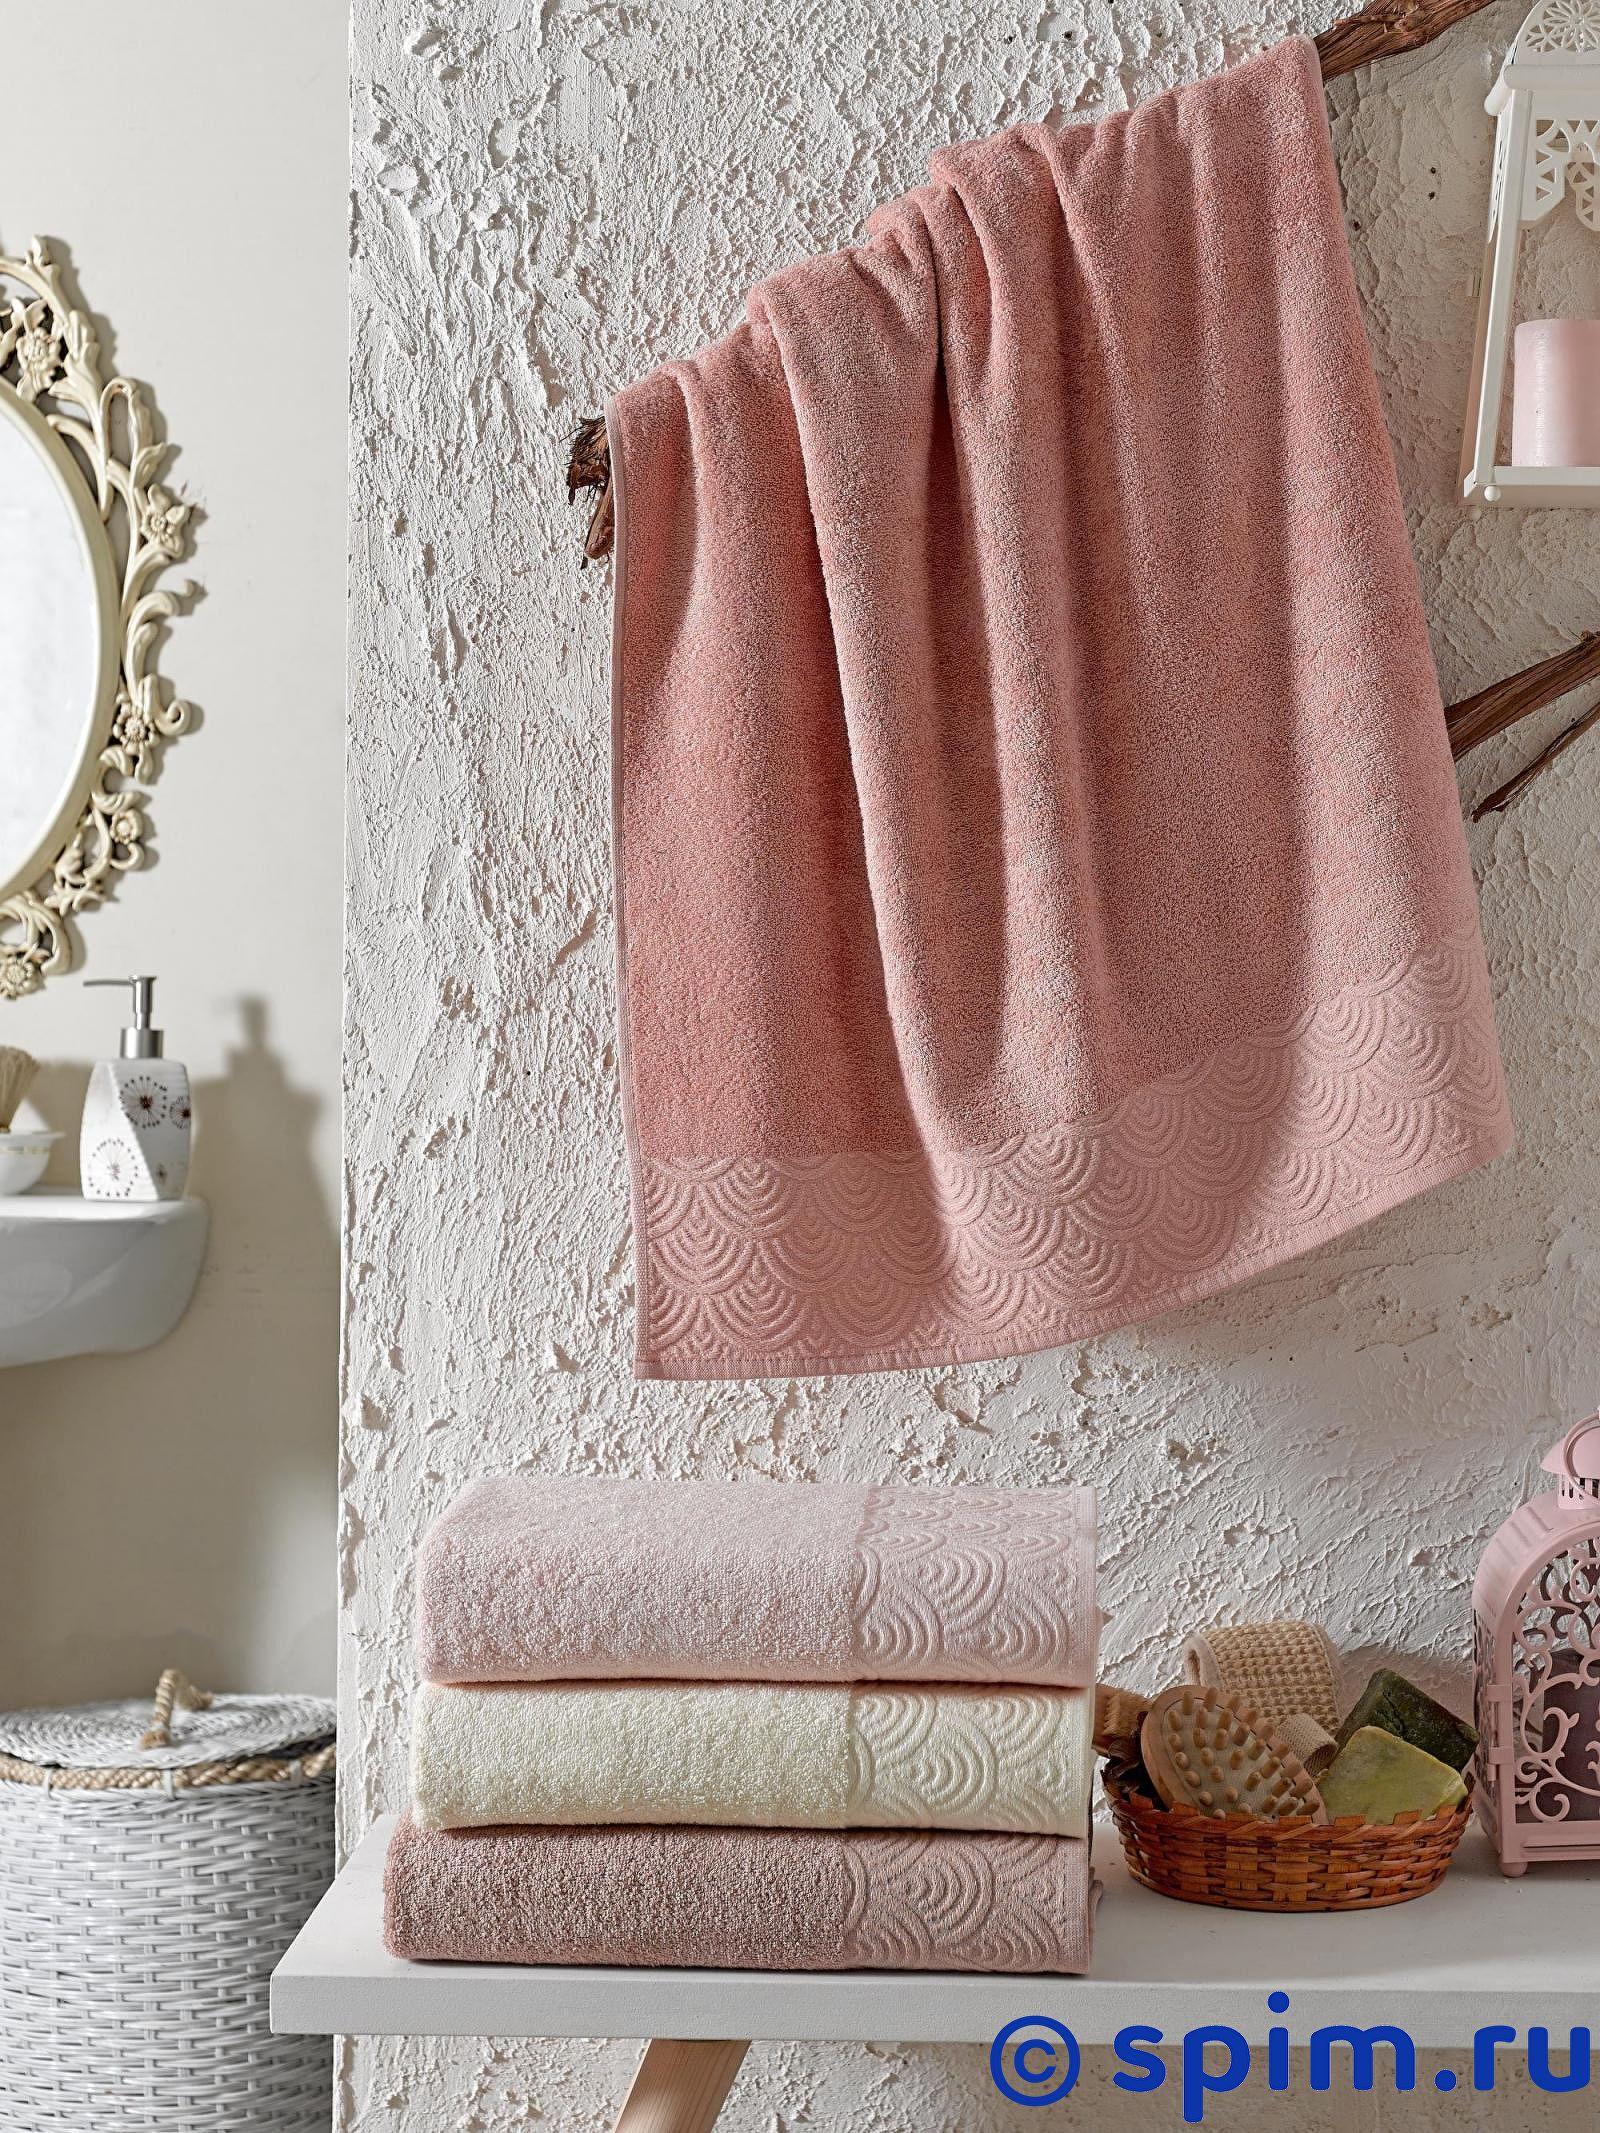 Набор из 4-х полотенец Do&co Rainbow 70х140 см полотенца do n co полотенце lady цвет мятный набор